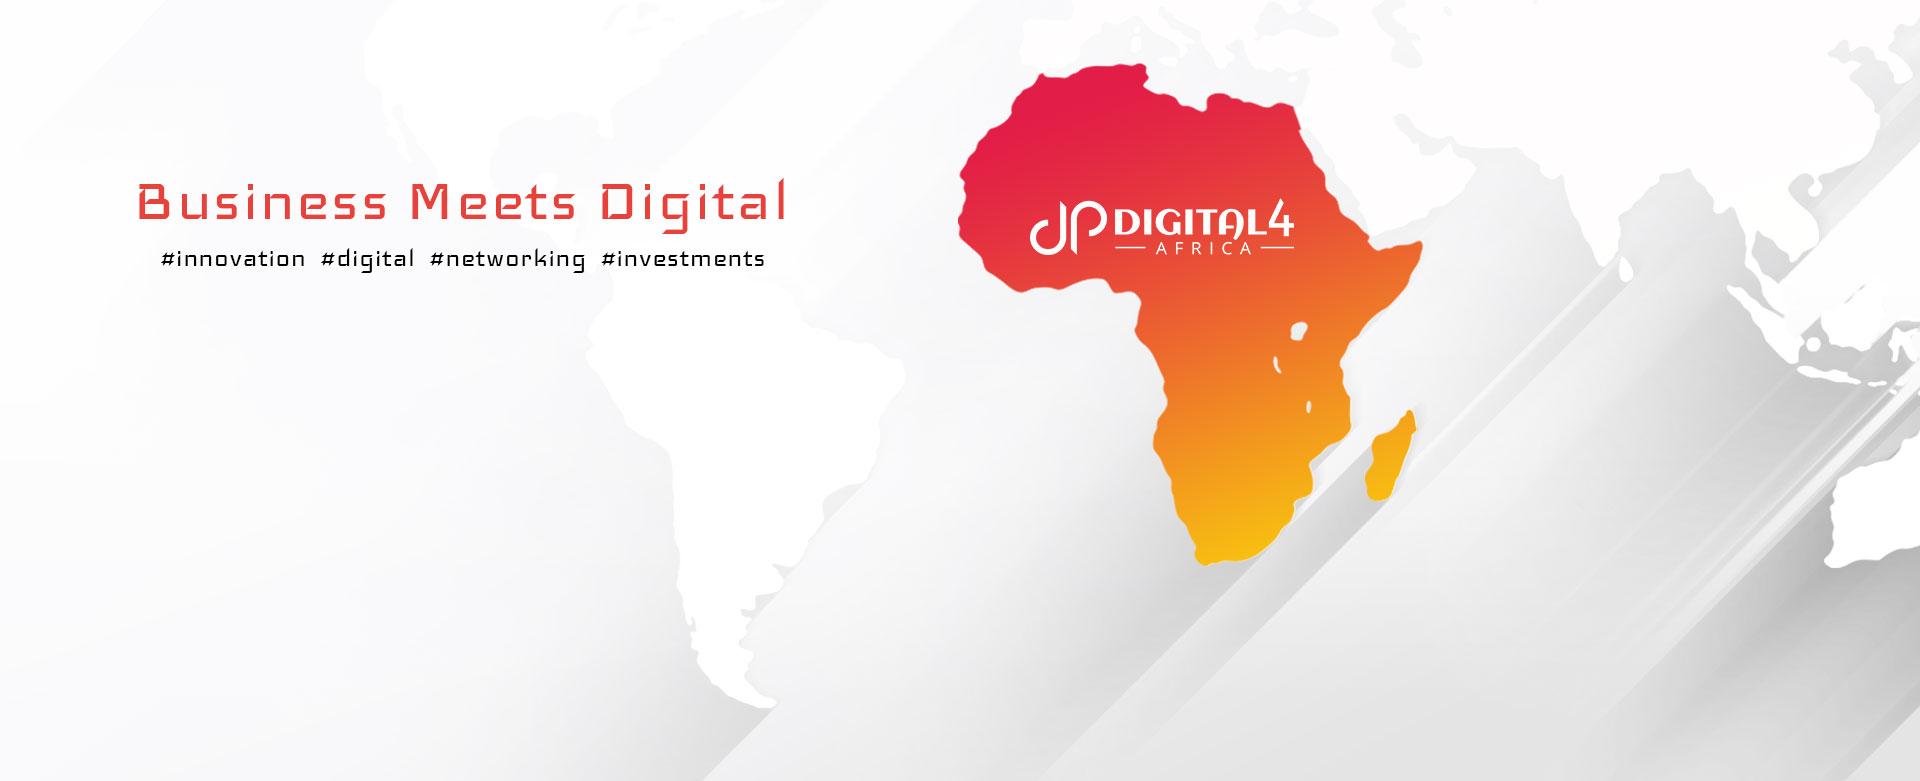 Digital4 Africa